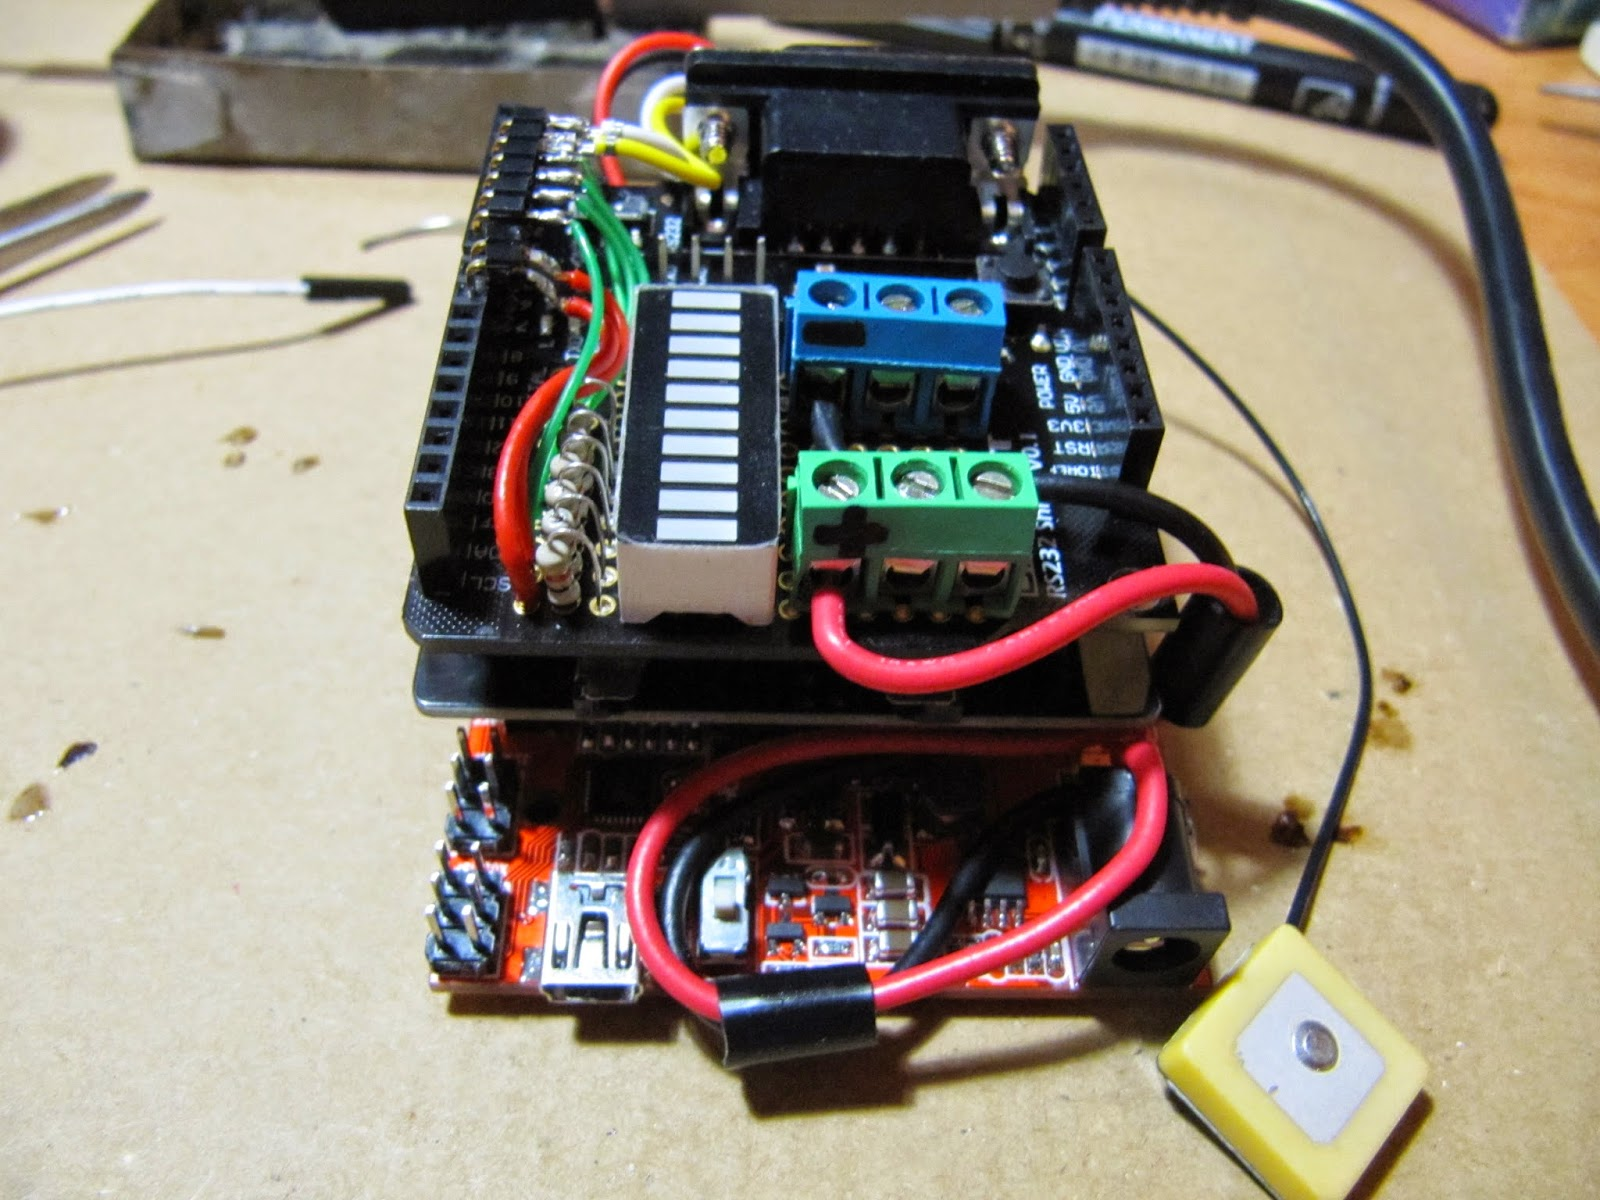 эхолот на базе arduino